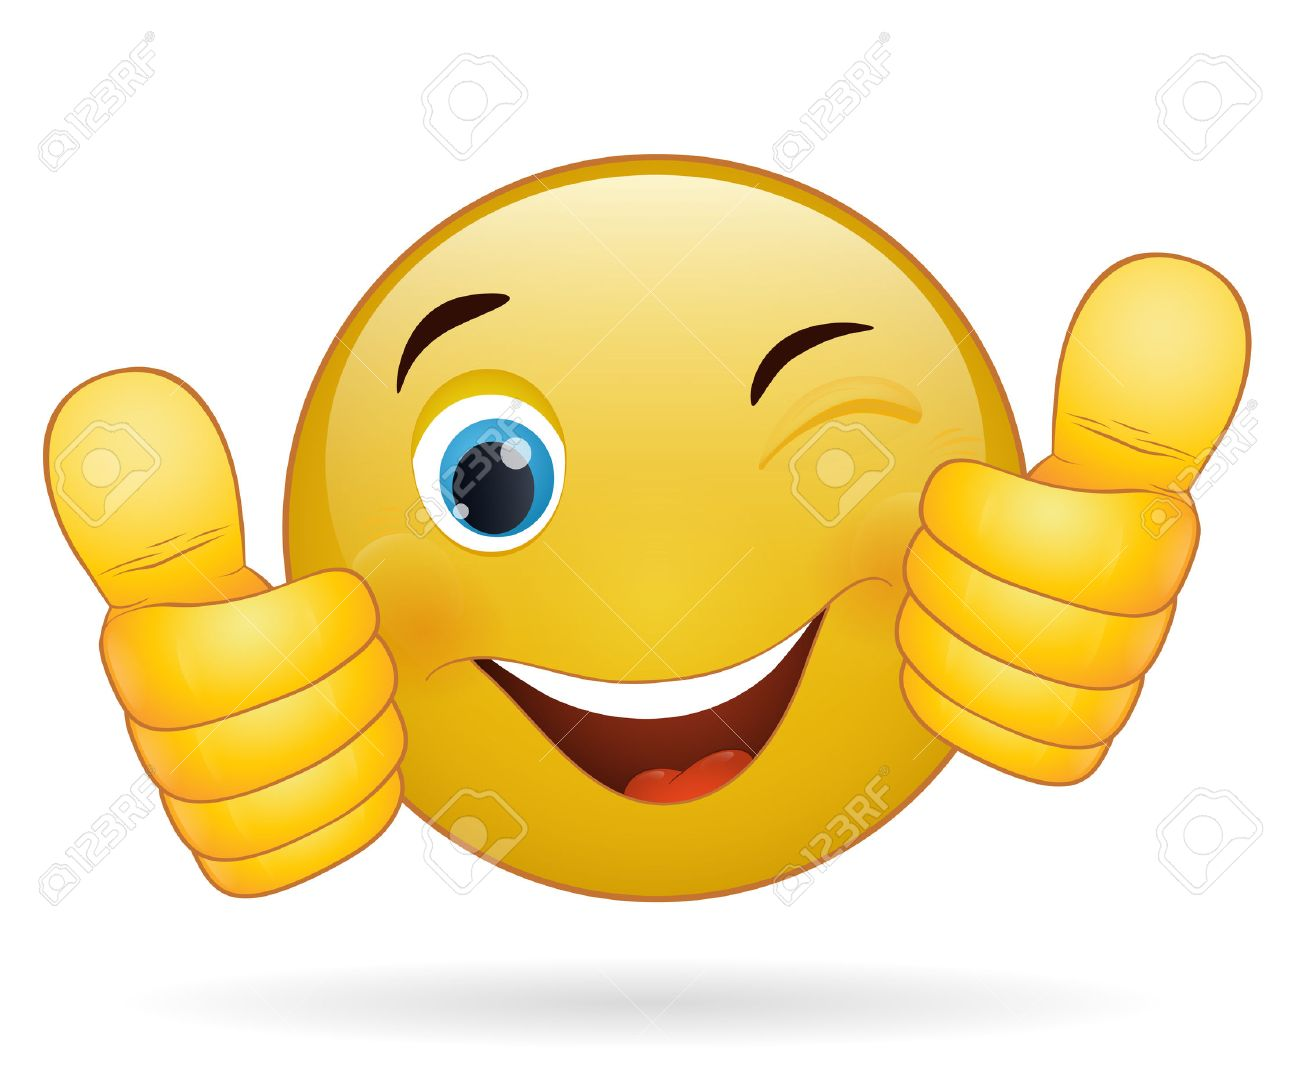 thumb up emoticon yellow cartoon sign facial expression royalty free cliparts vectors and stock illustration image 27927096 thumb up emoticon yellow cartoon sign facial expression